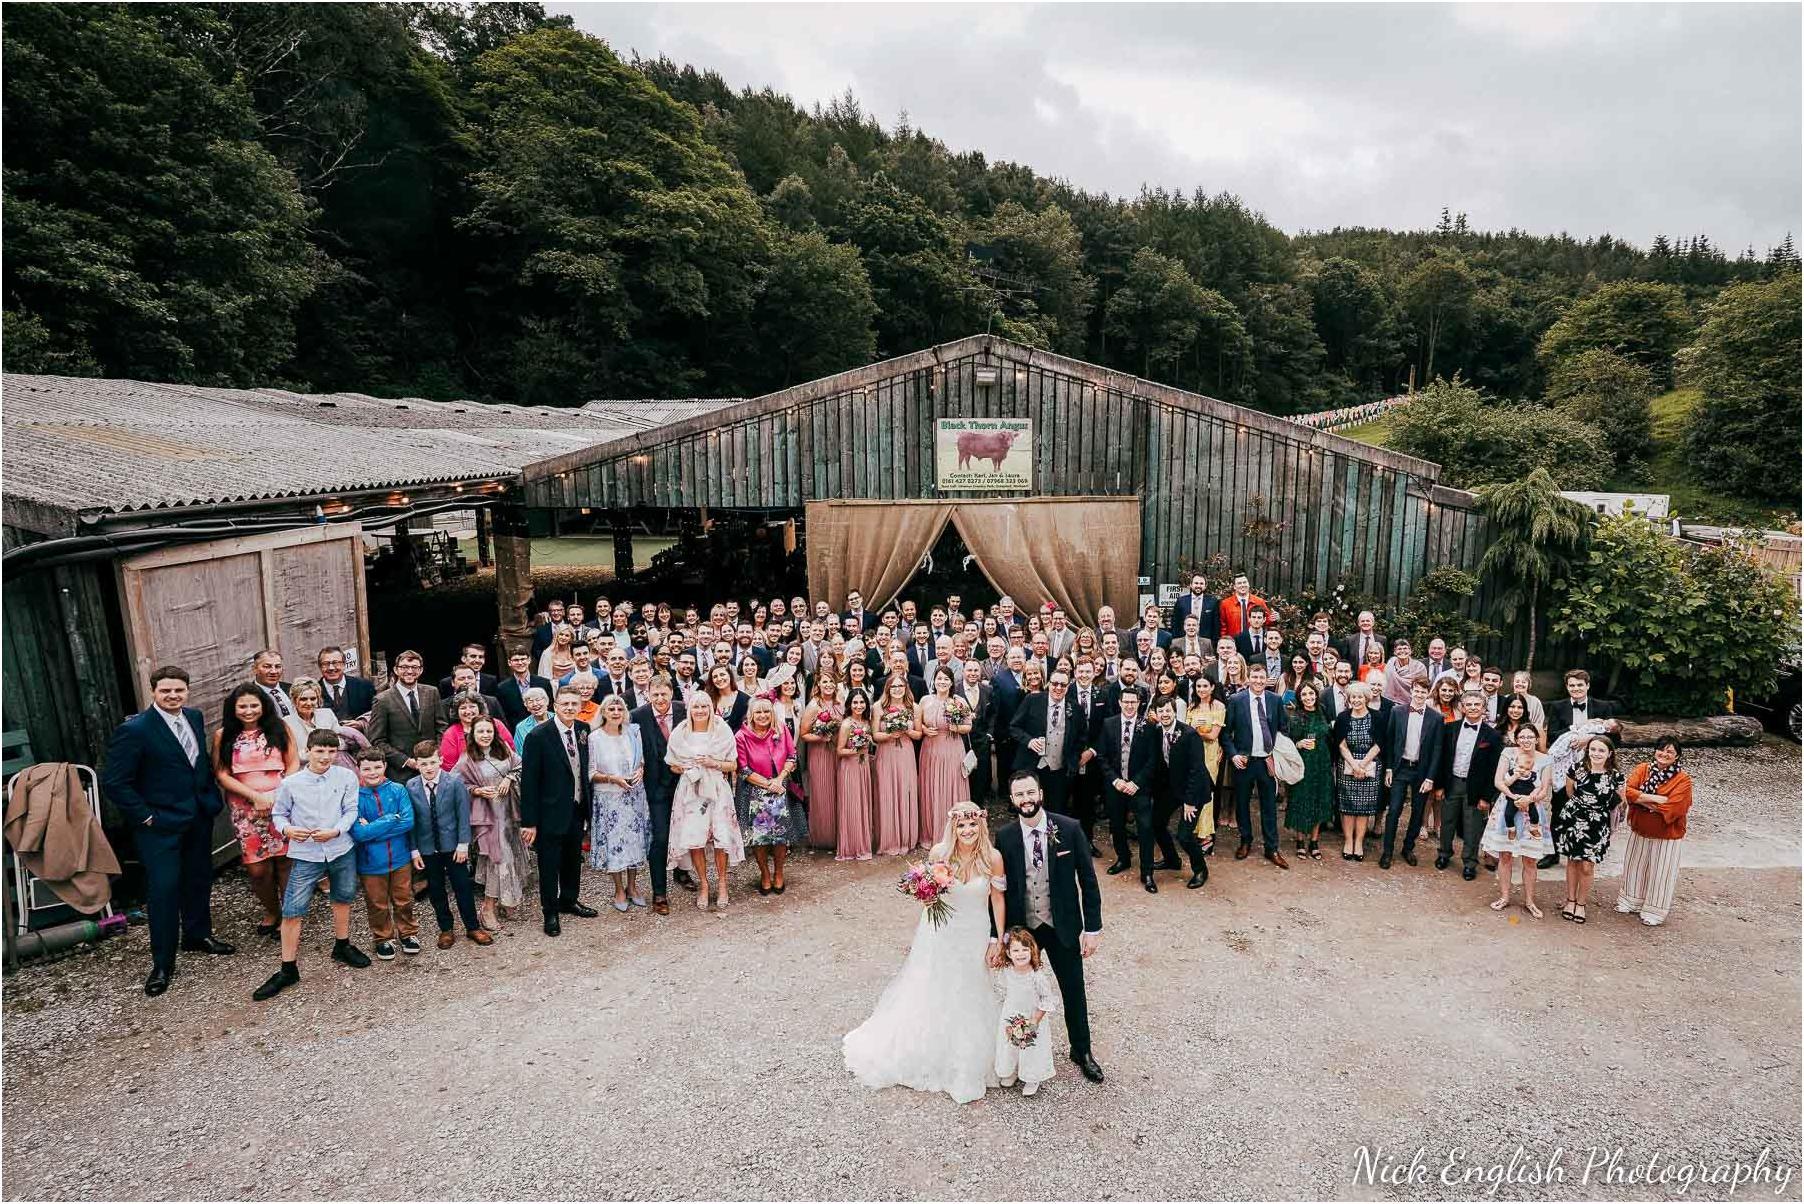 Whitebottom_Farm_Wedding_Manchester_Photograph-58.jpg